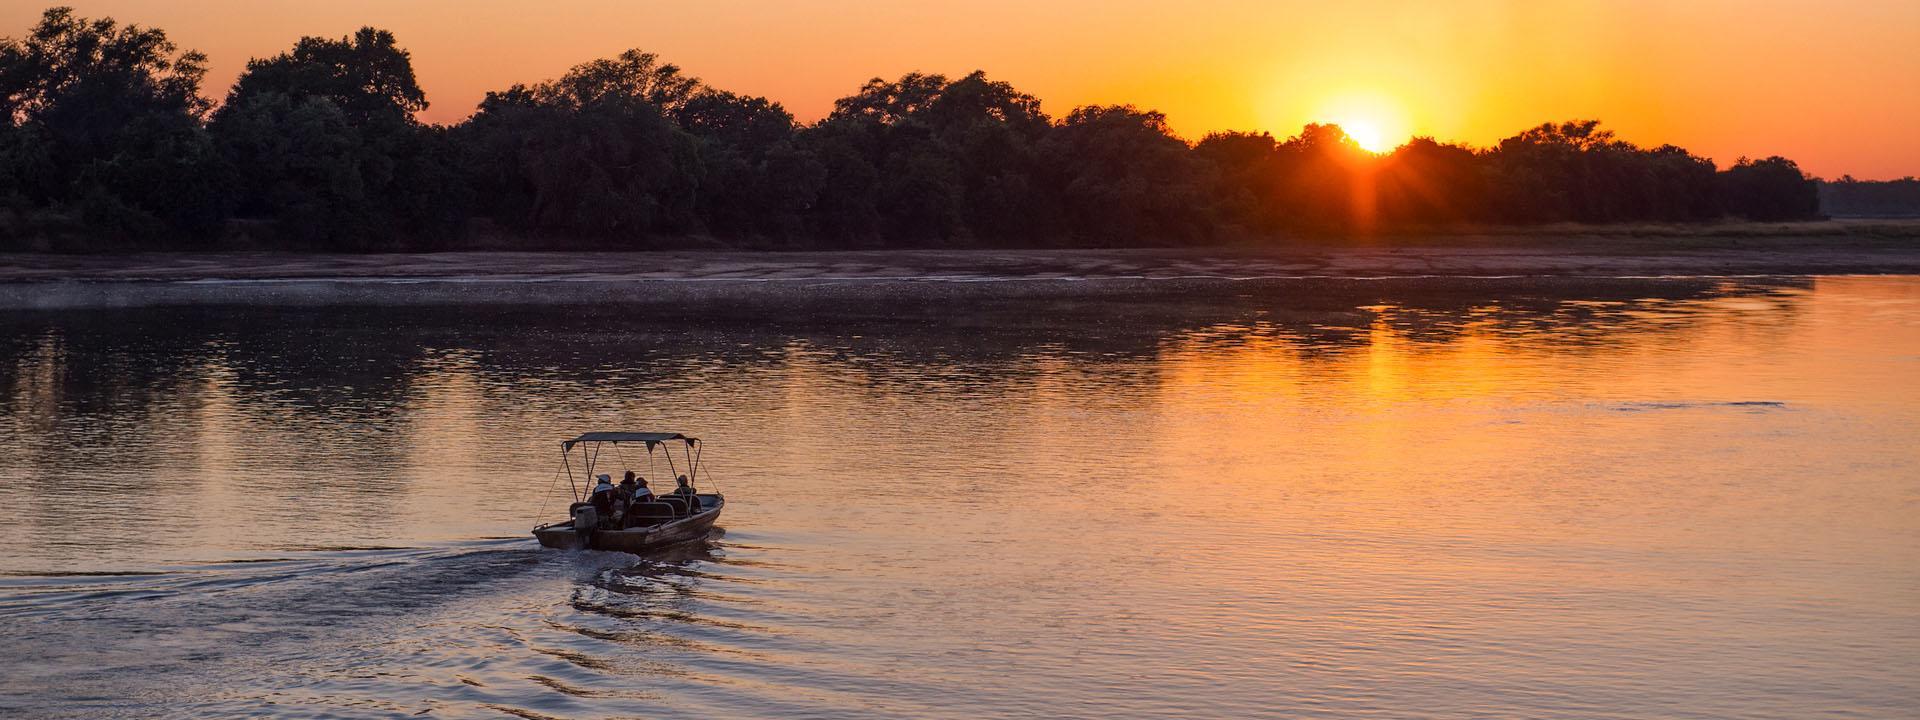 Luangwa-Boot-Sonnenuntergang